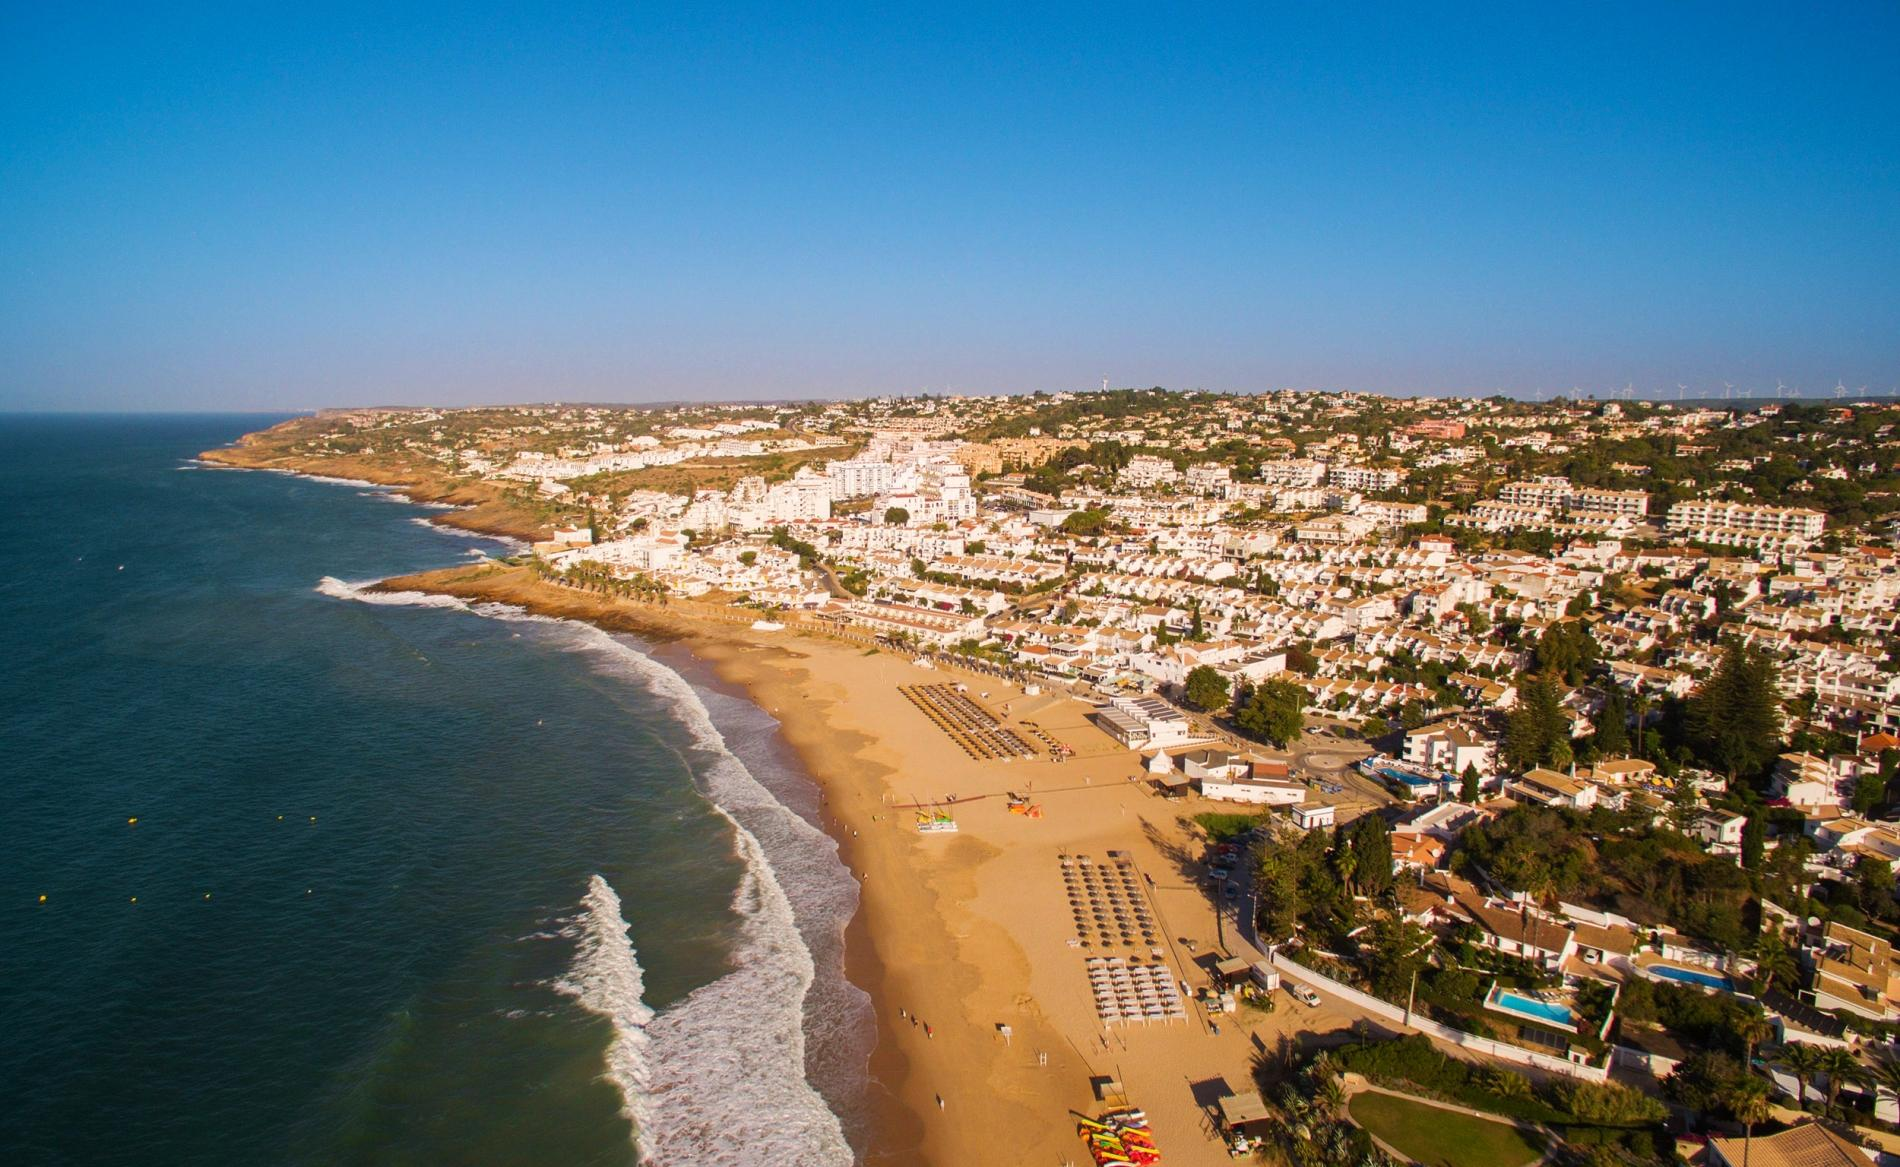 Ferienwohnung B29 - LuzBay Duplex (2558092), Luz, , Algarve, Portugal, Bild 42